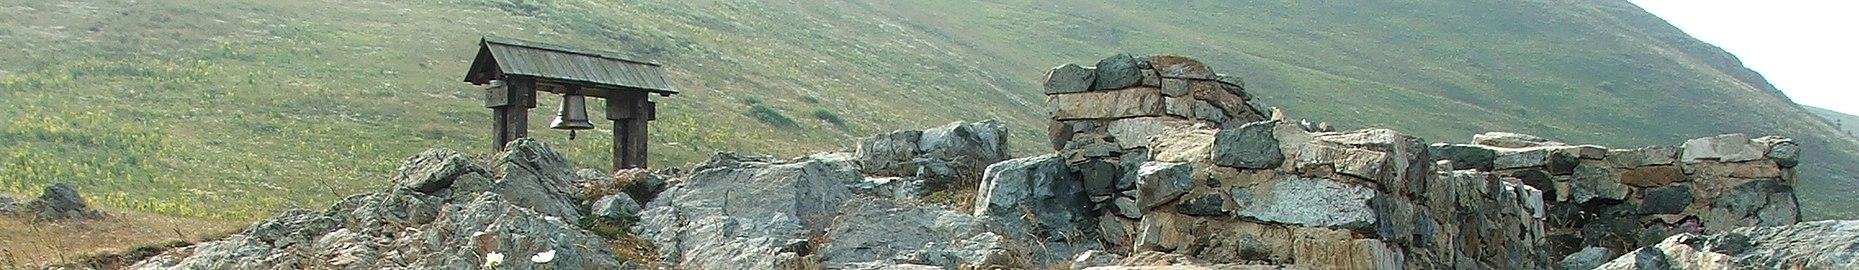 Kopaonik National Park Wikivoyage Banner.jpg